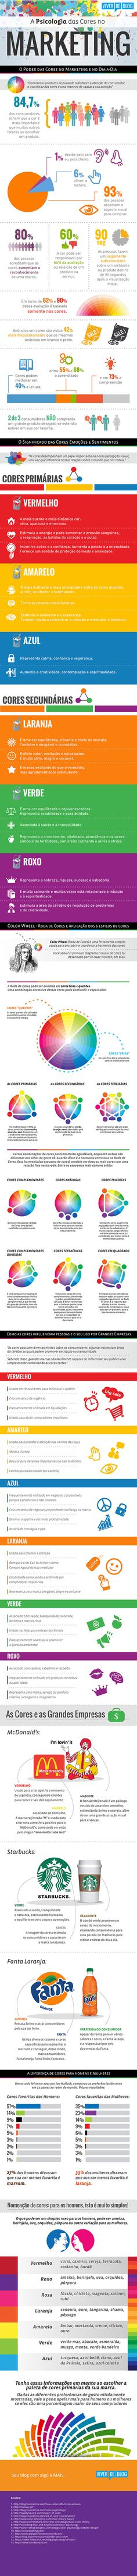 psicologia das cores - infográfico.